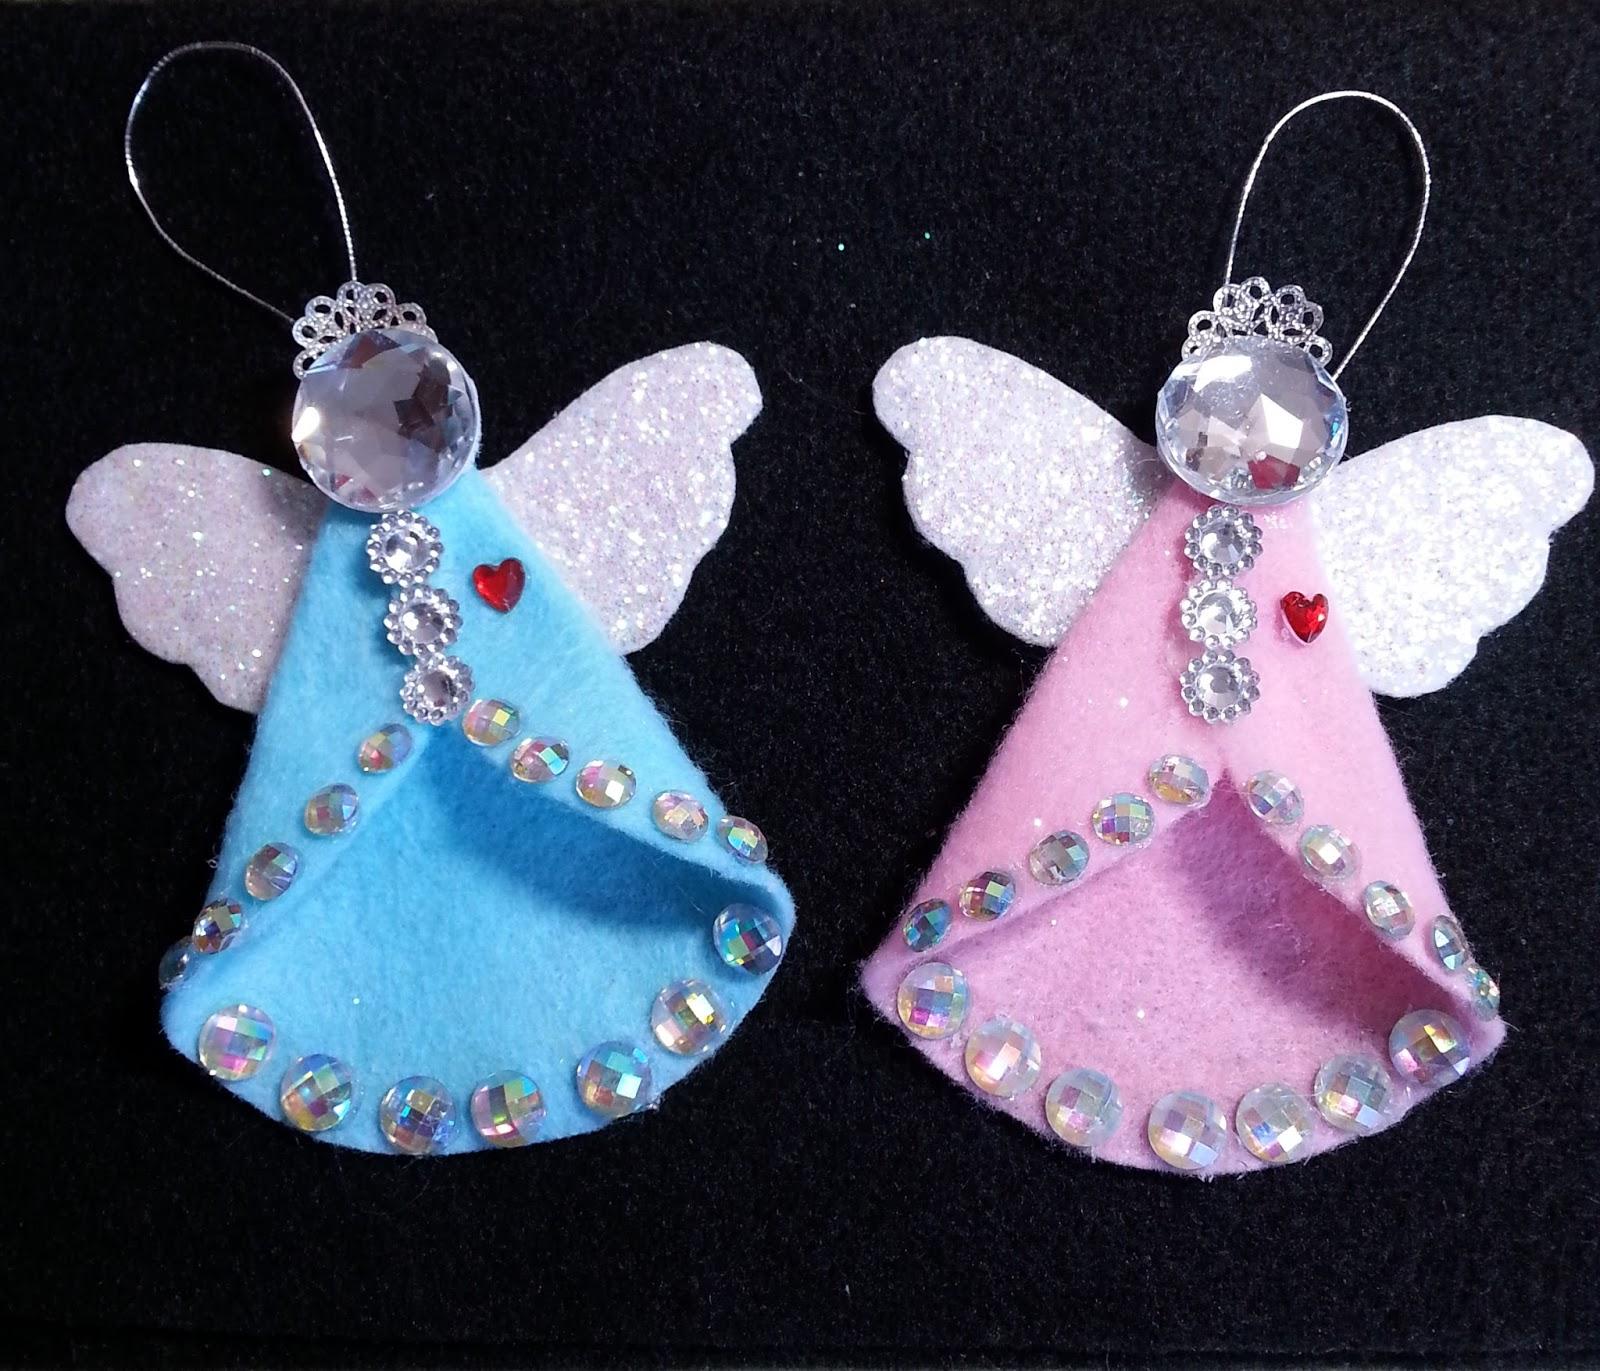 Felt Angel Patterns Felt Angel Ornament With